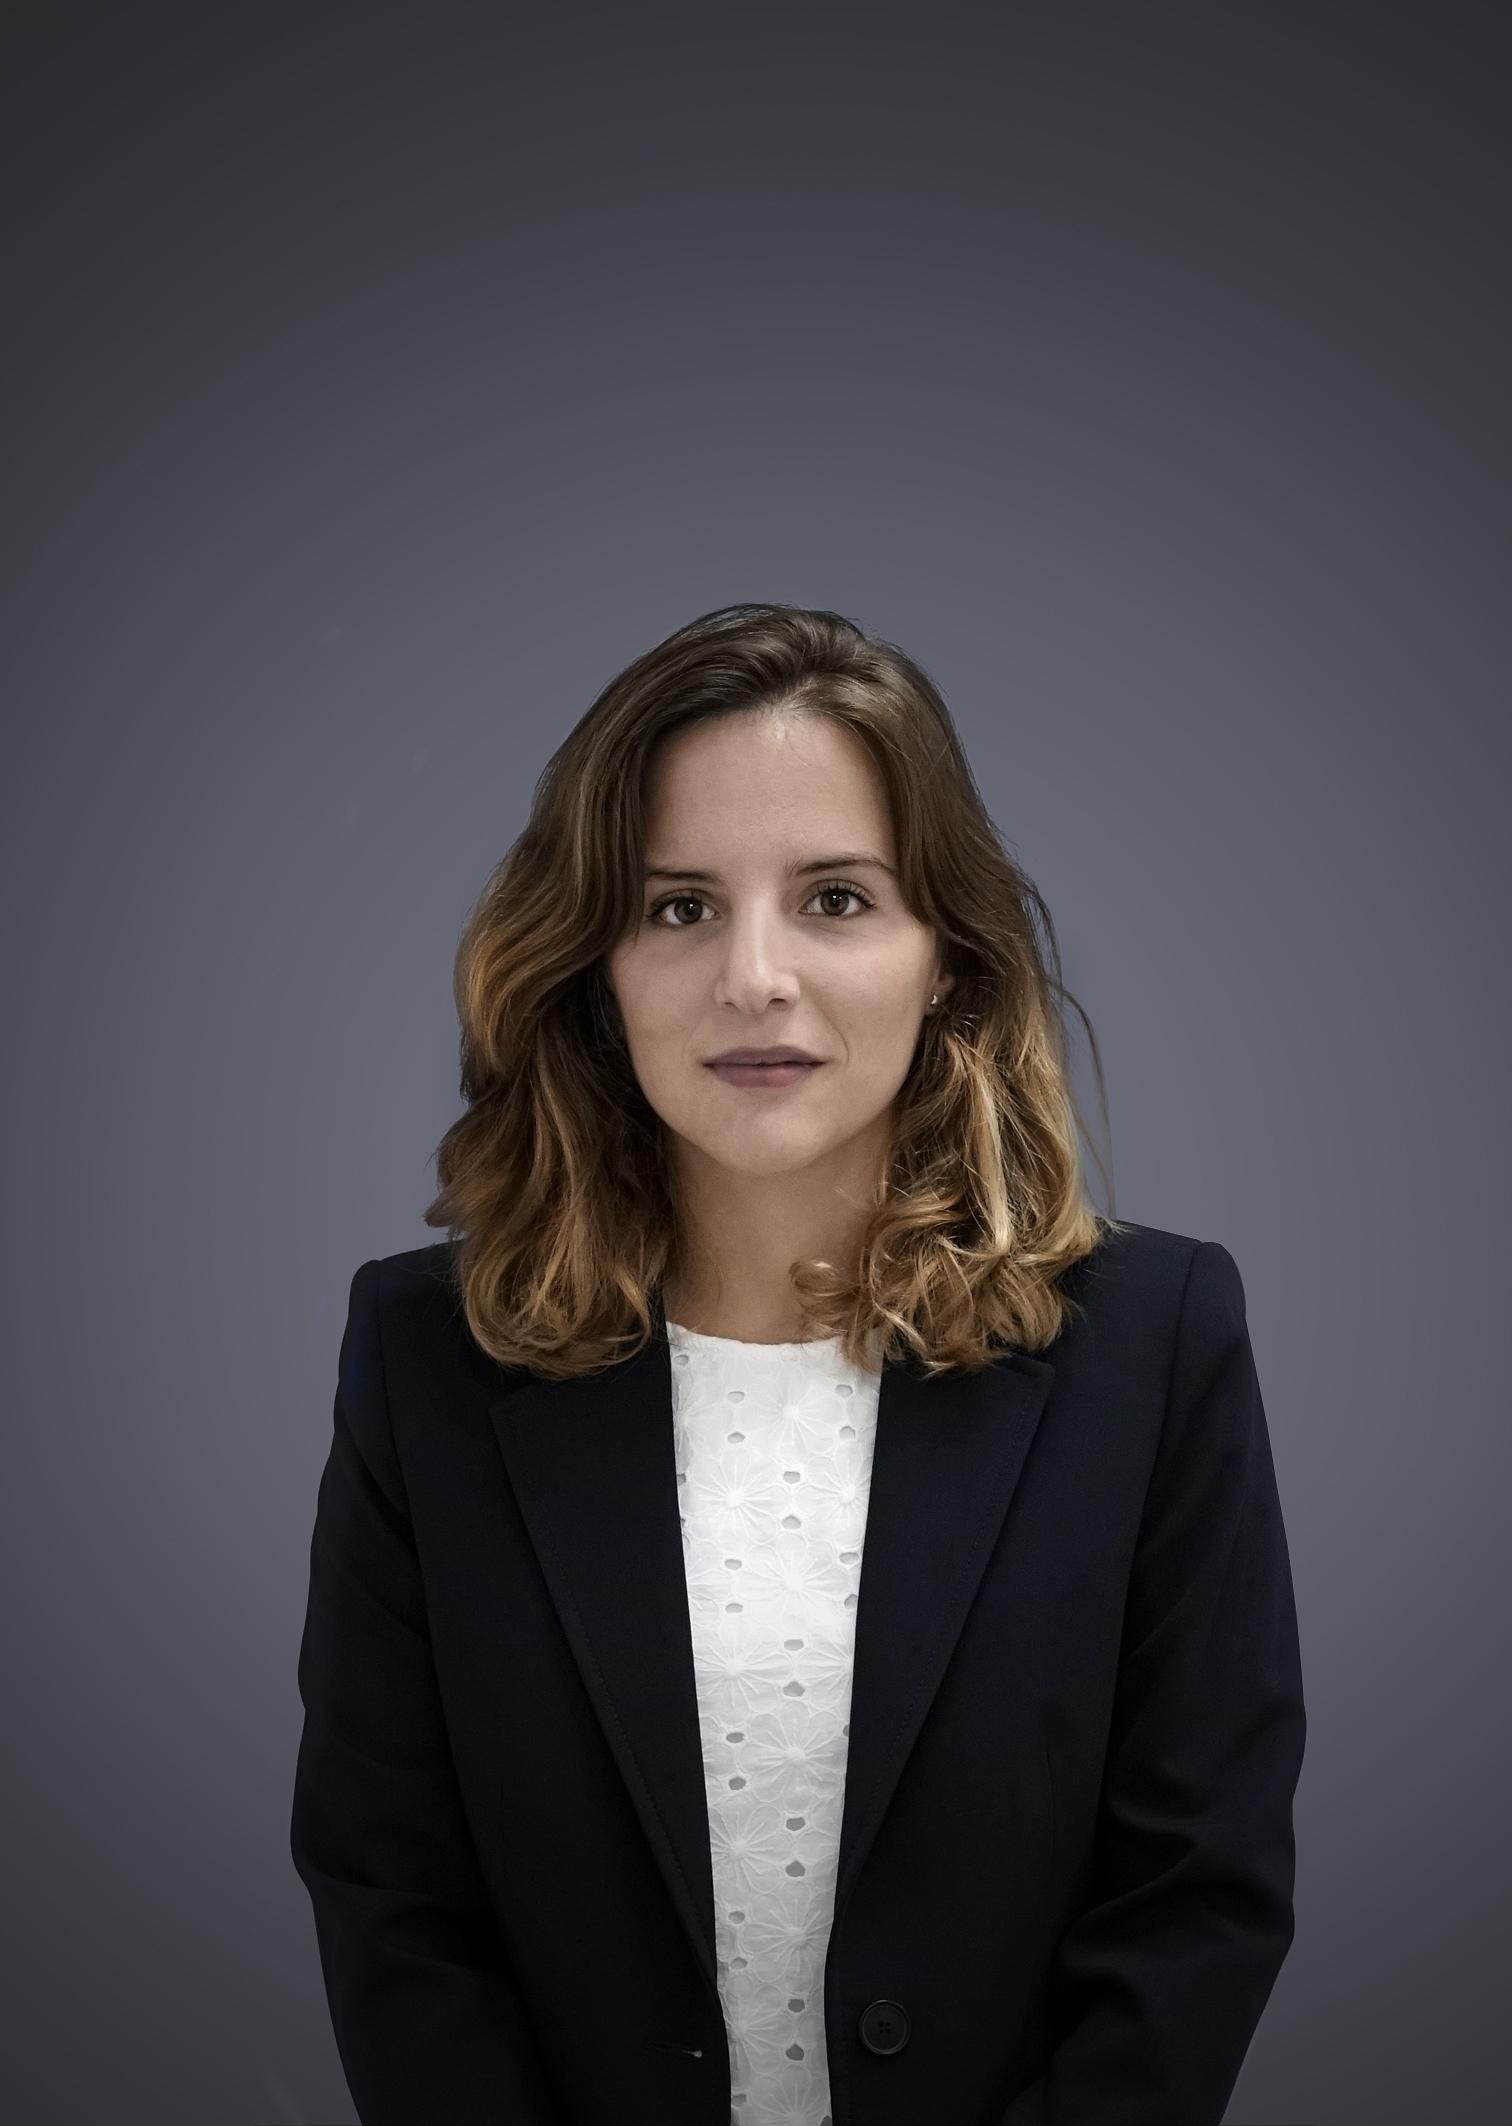 Sara Sanchis Muñoz